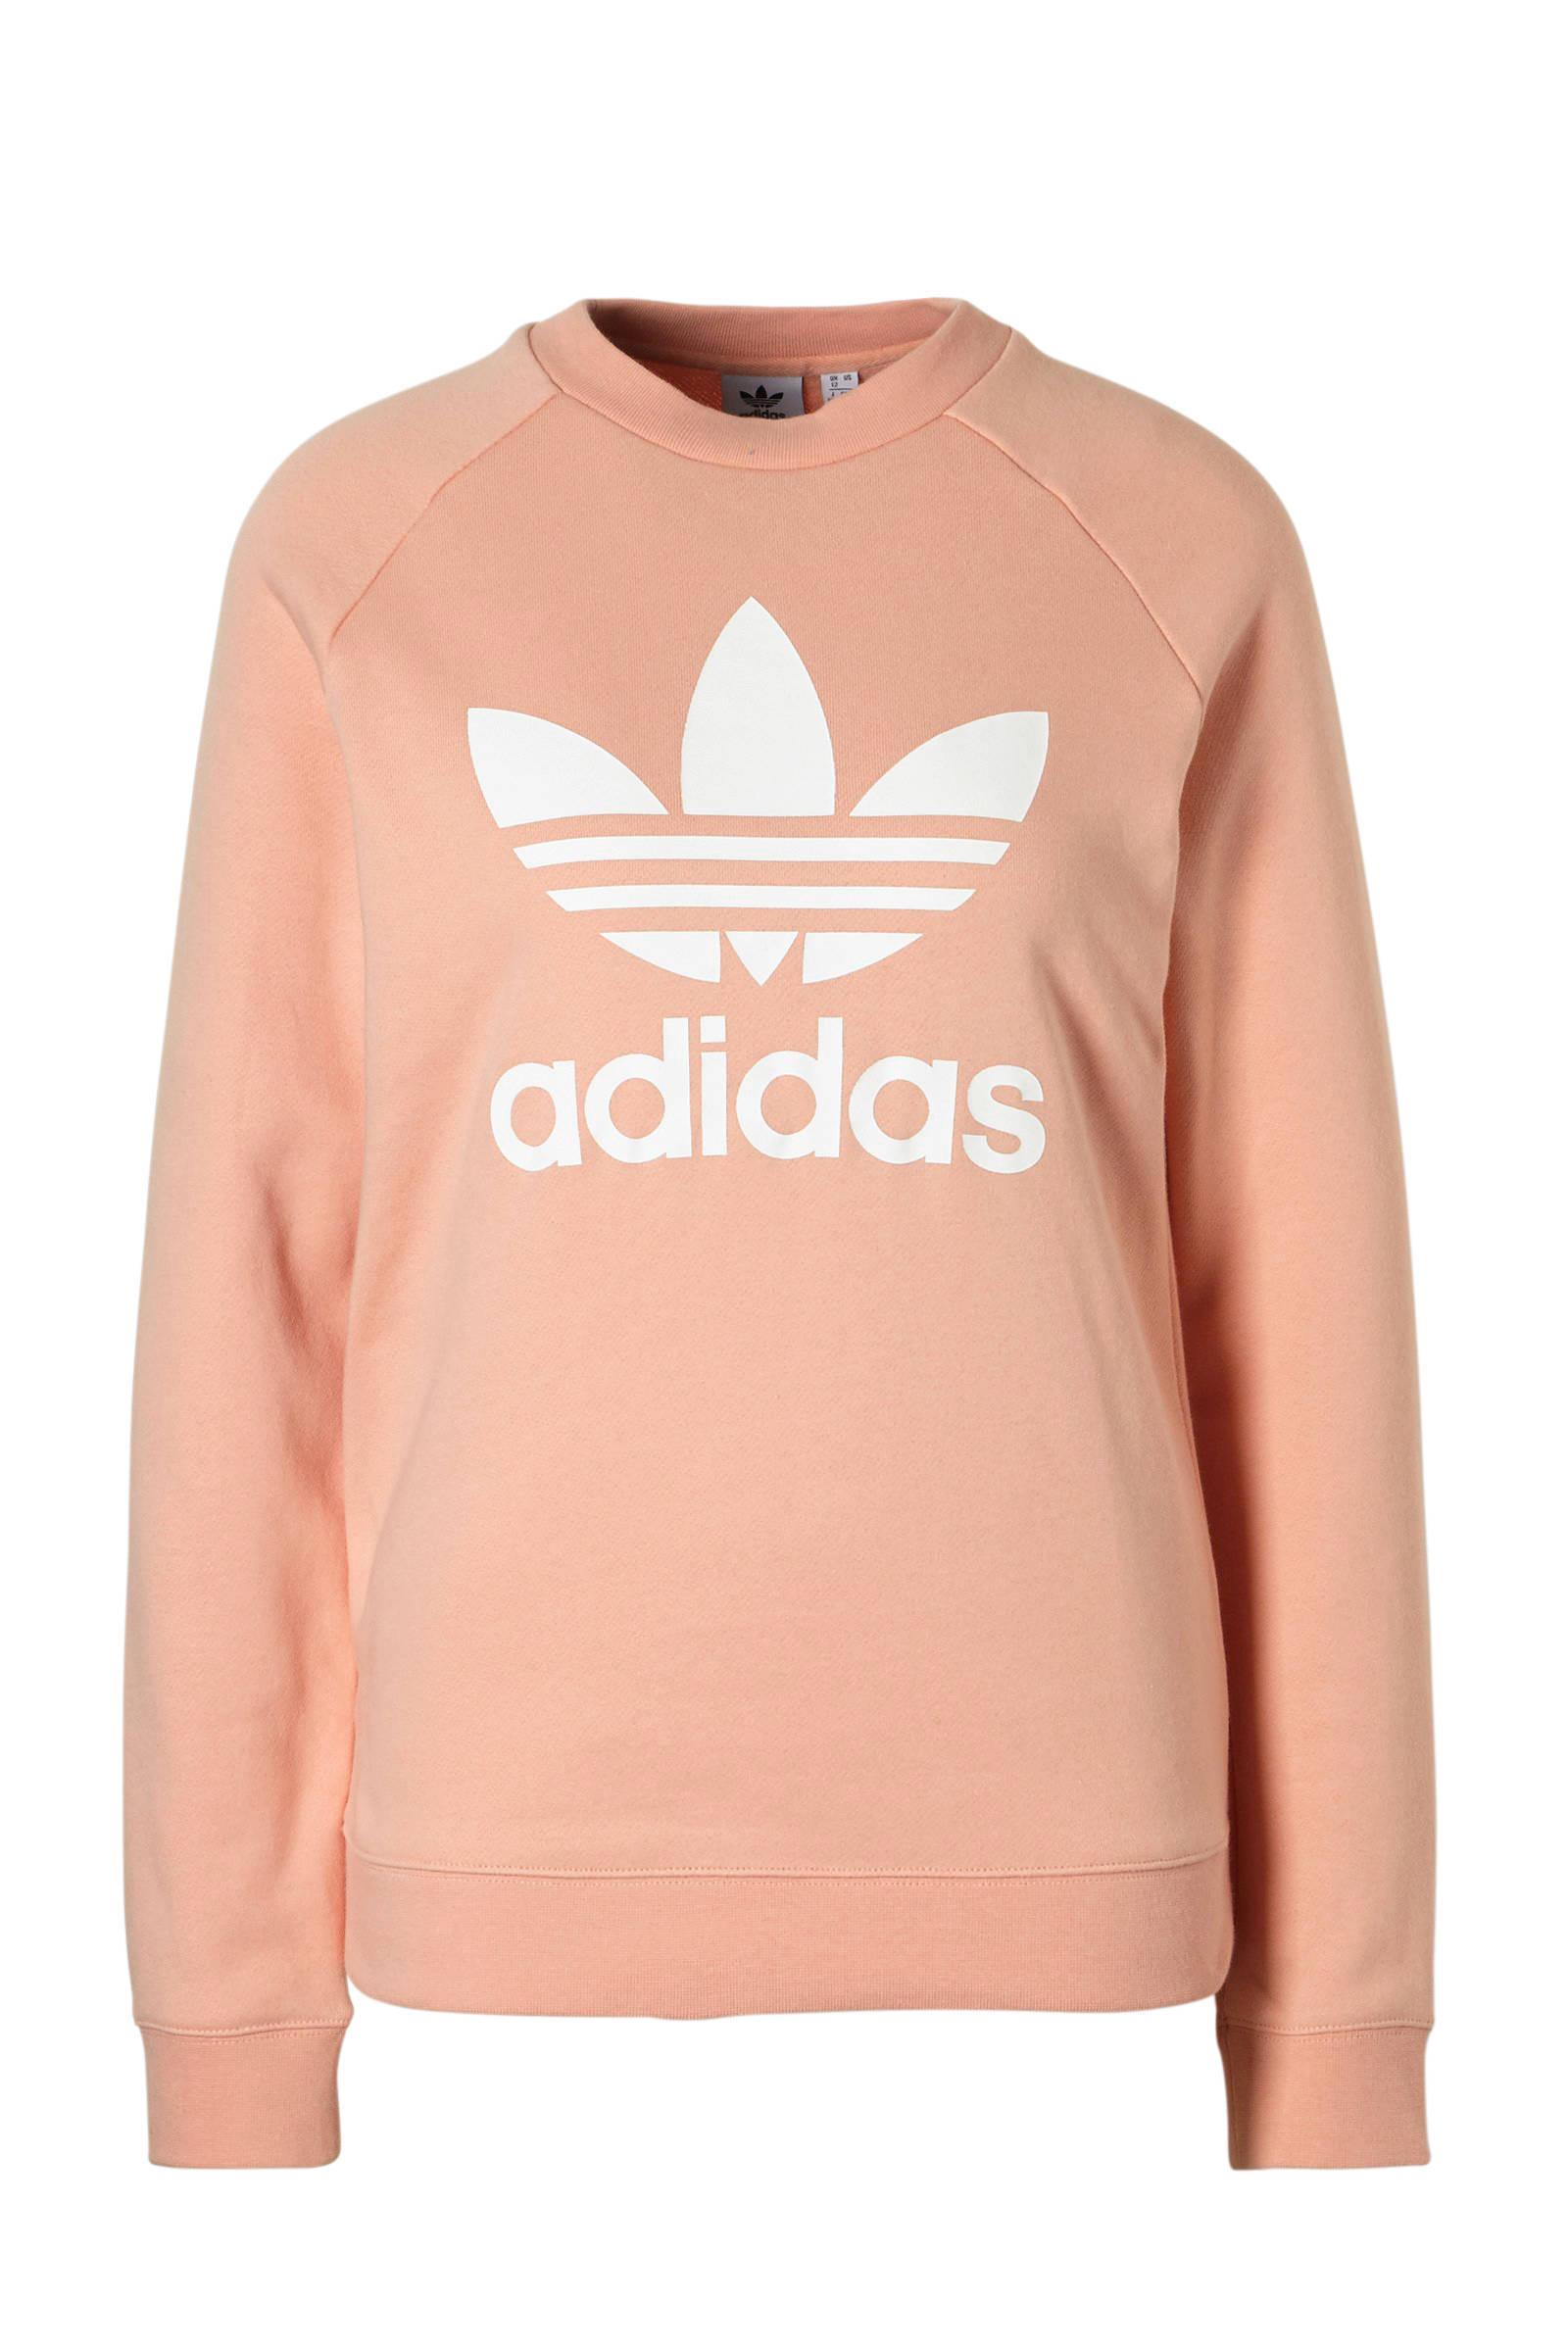 Adidas Sweater Adidas Sweater Originals Originals Adidas ZalmrozeWehkamp Originals ZalmrozeWehkamp EH29DYbeWI